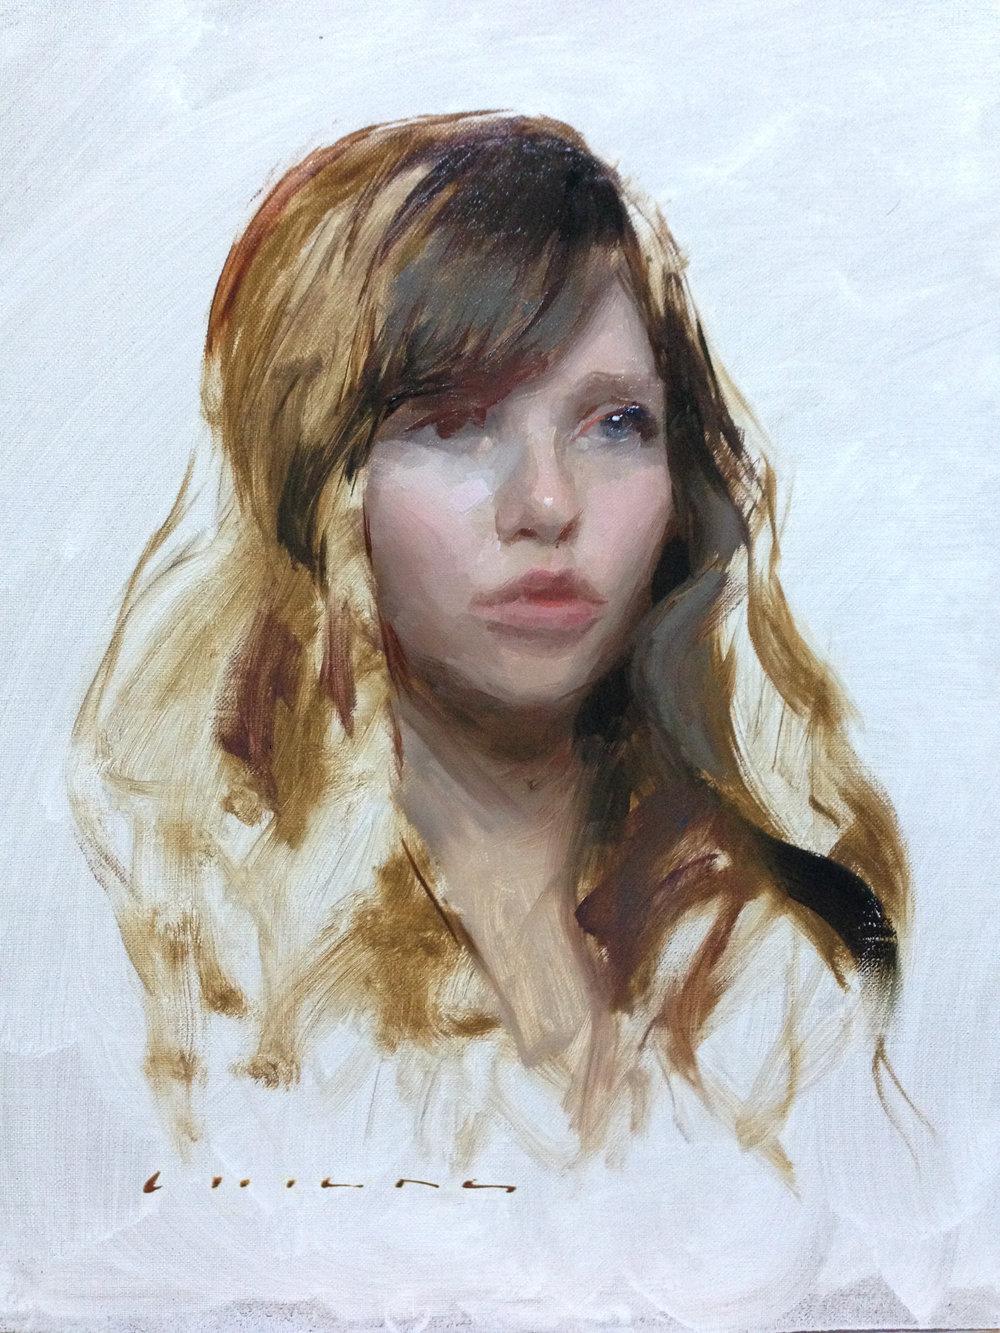 CaseyChilds_PortraitSketch_14x11_oil.JPG